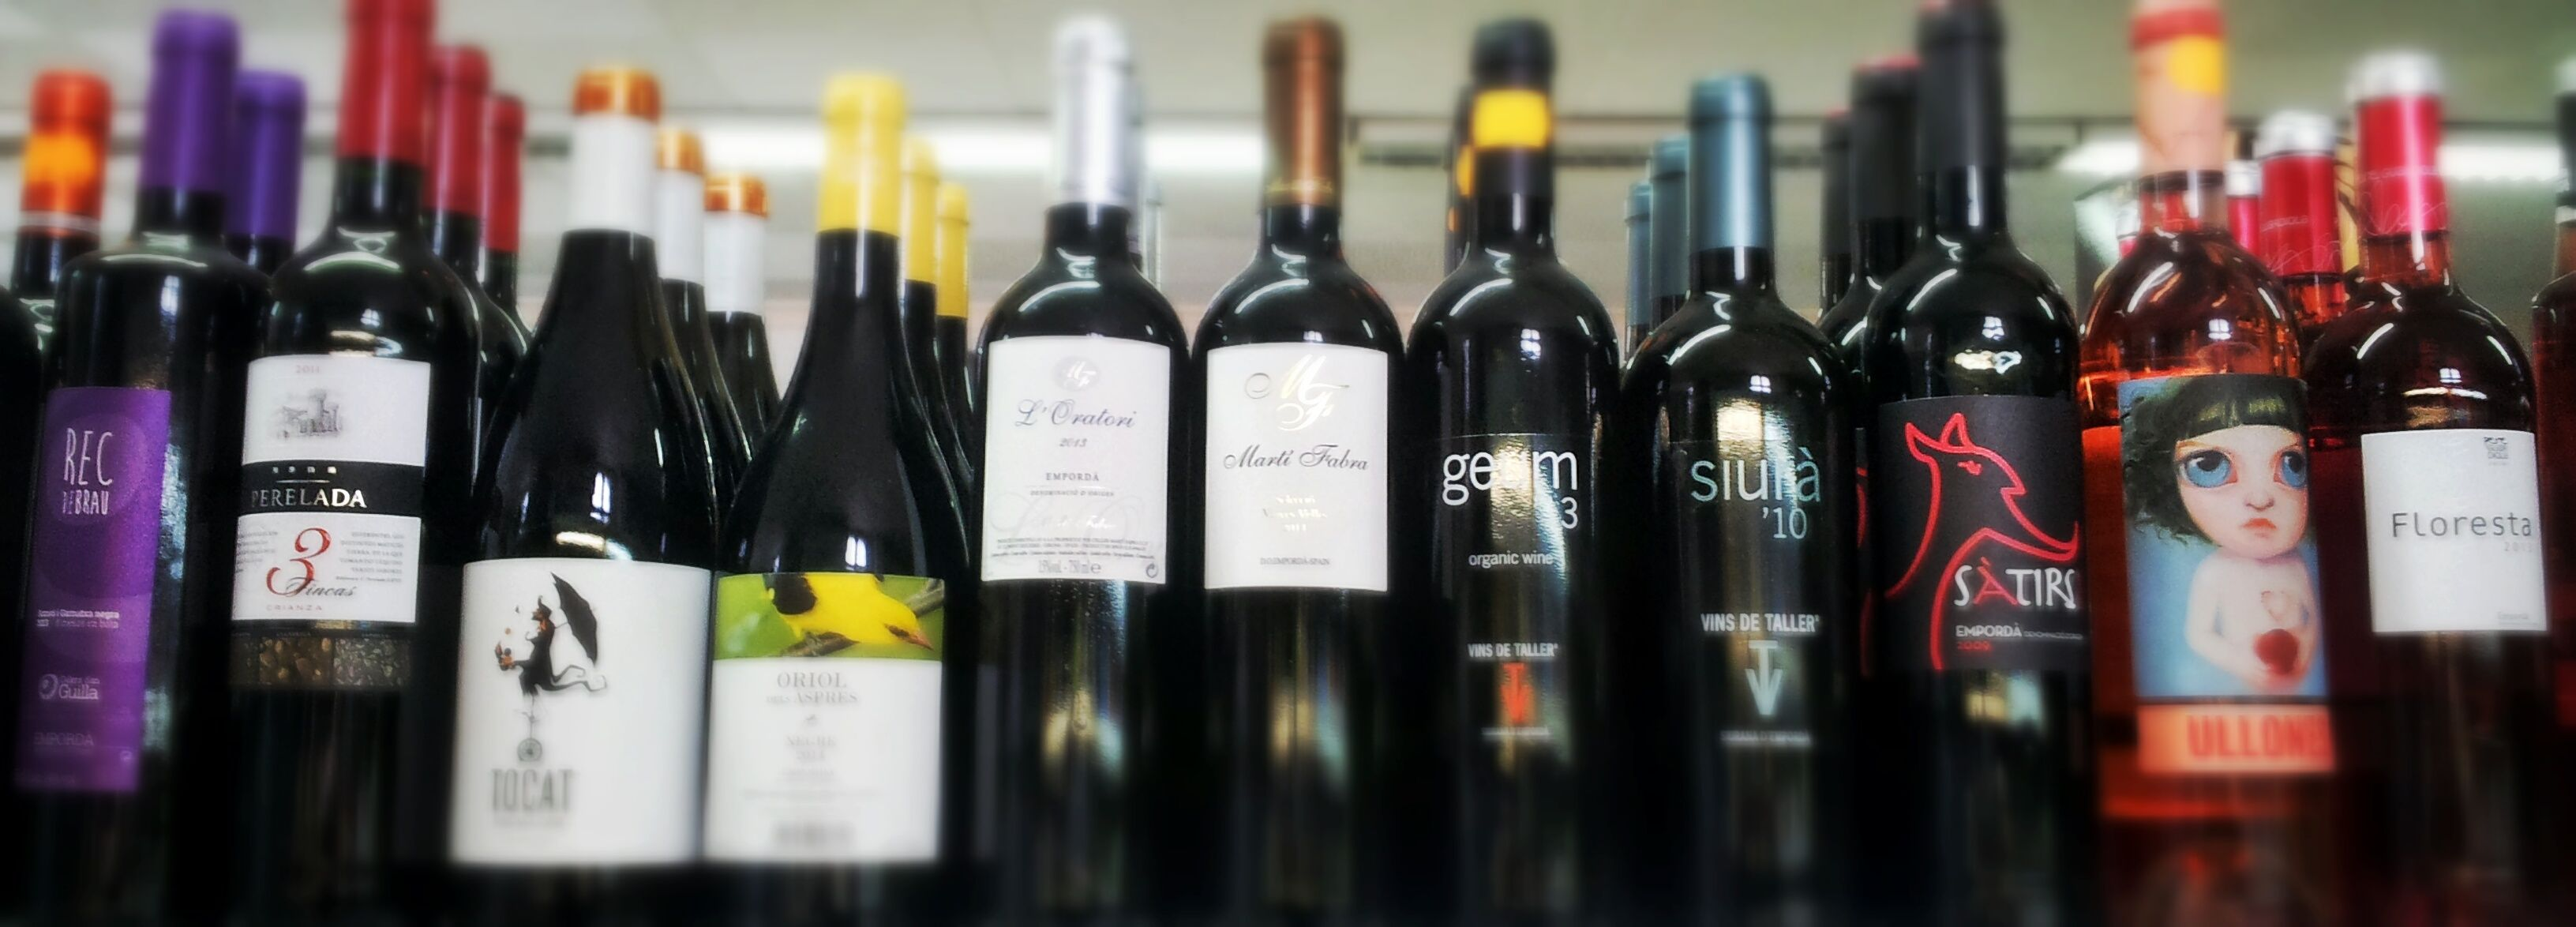 Muestra de vinos D.O. Empordà en Girona